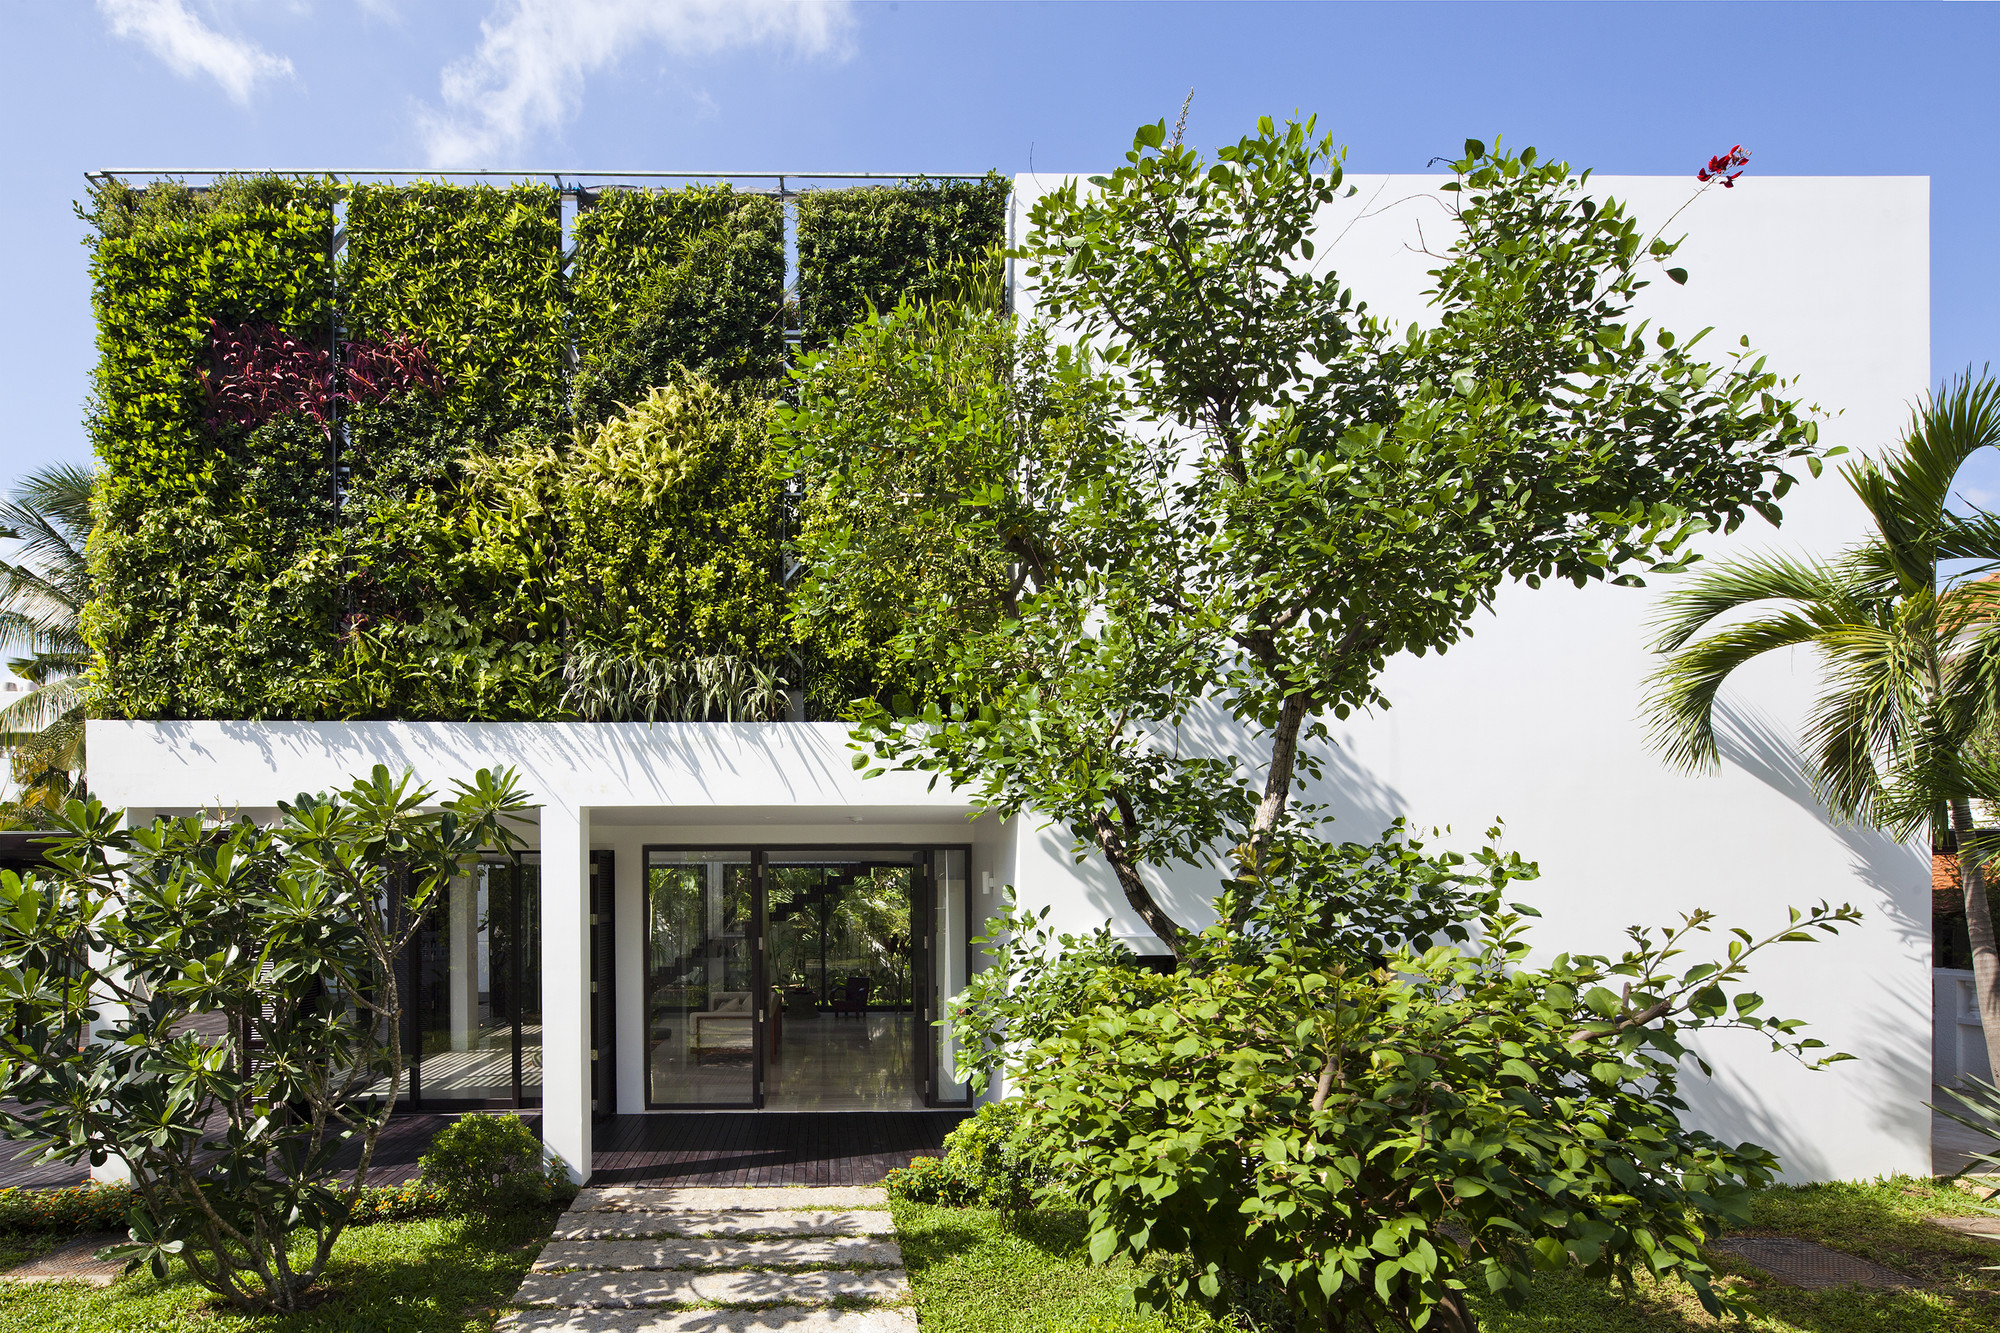 Thao Dien House / MM++ architects, © Hiroyuki OKI